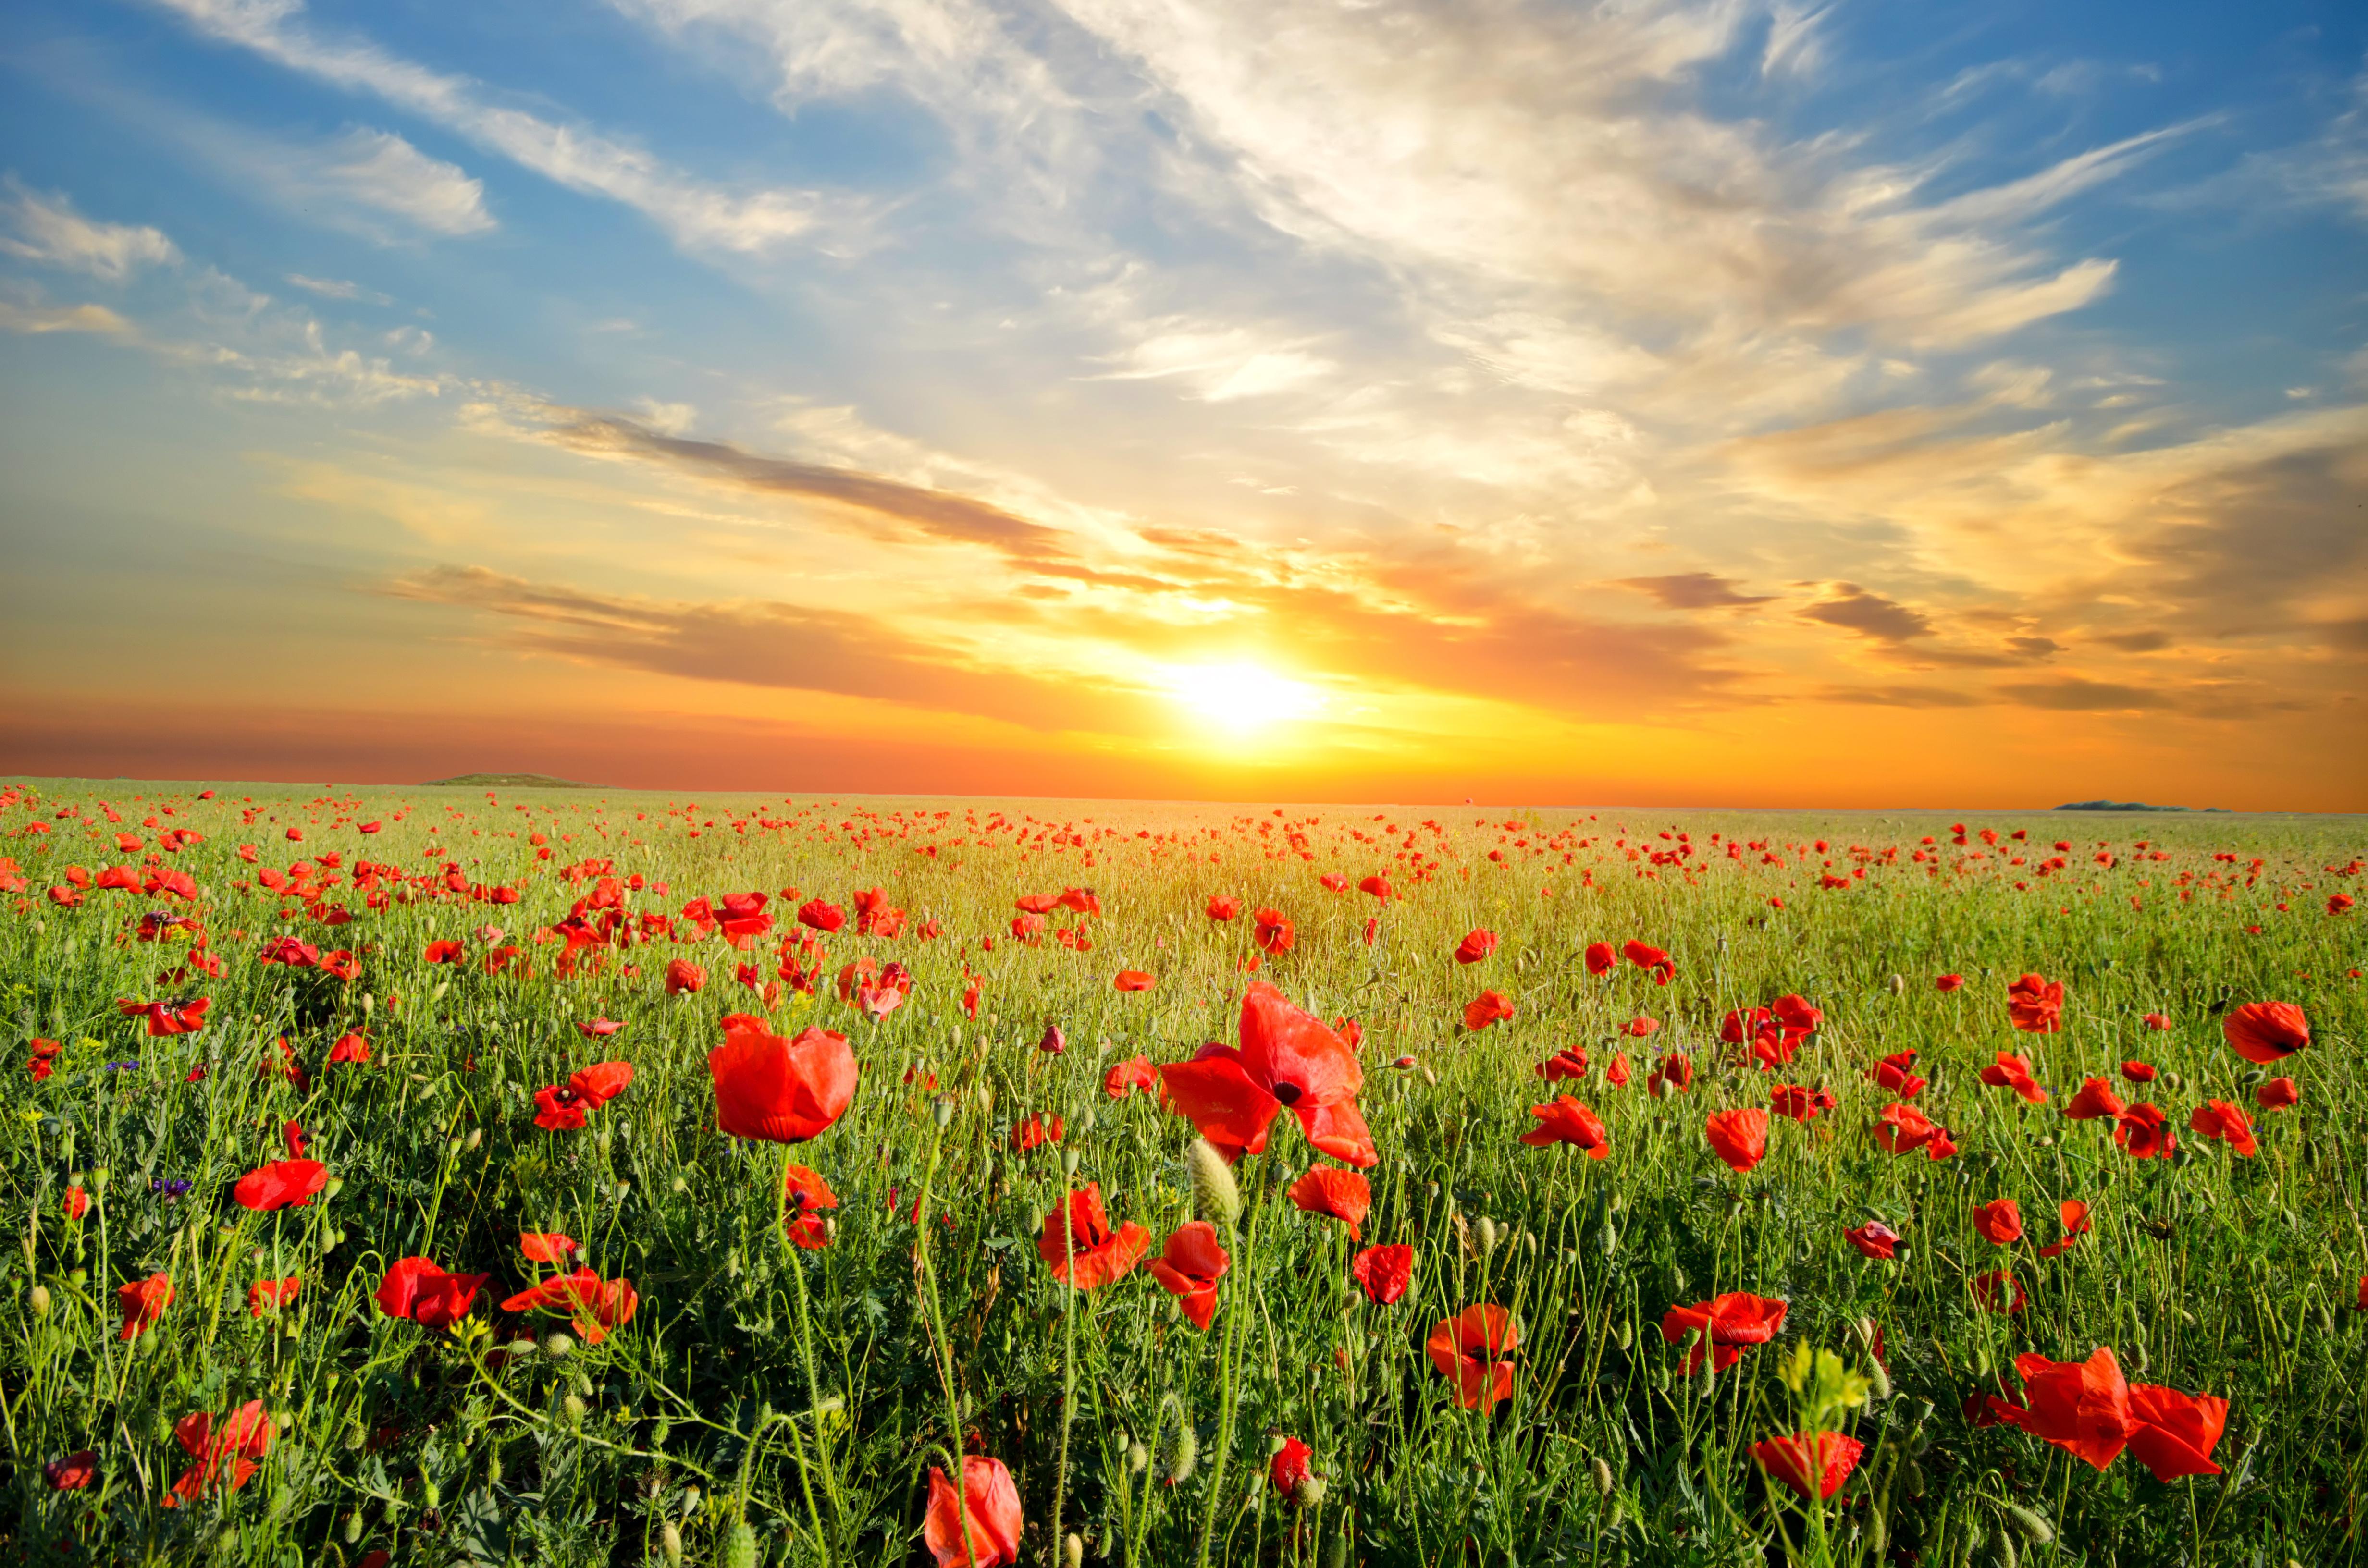 цветочная поляна небо закат без смс